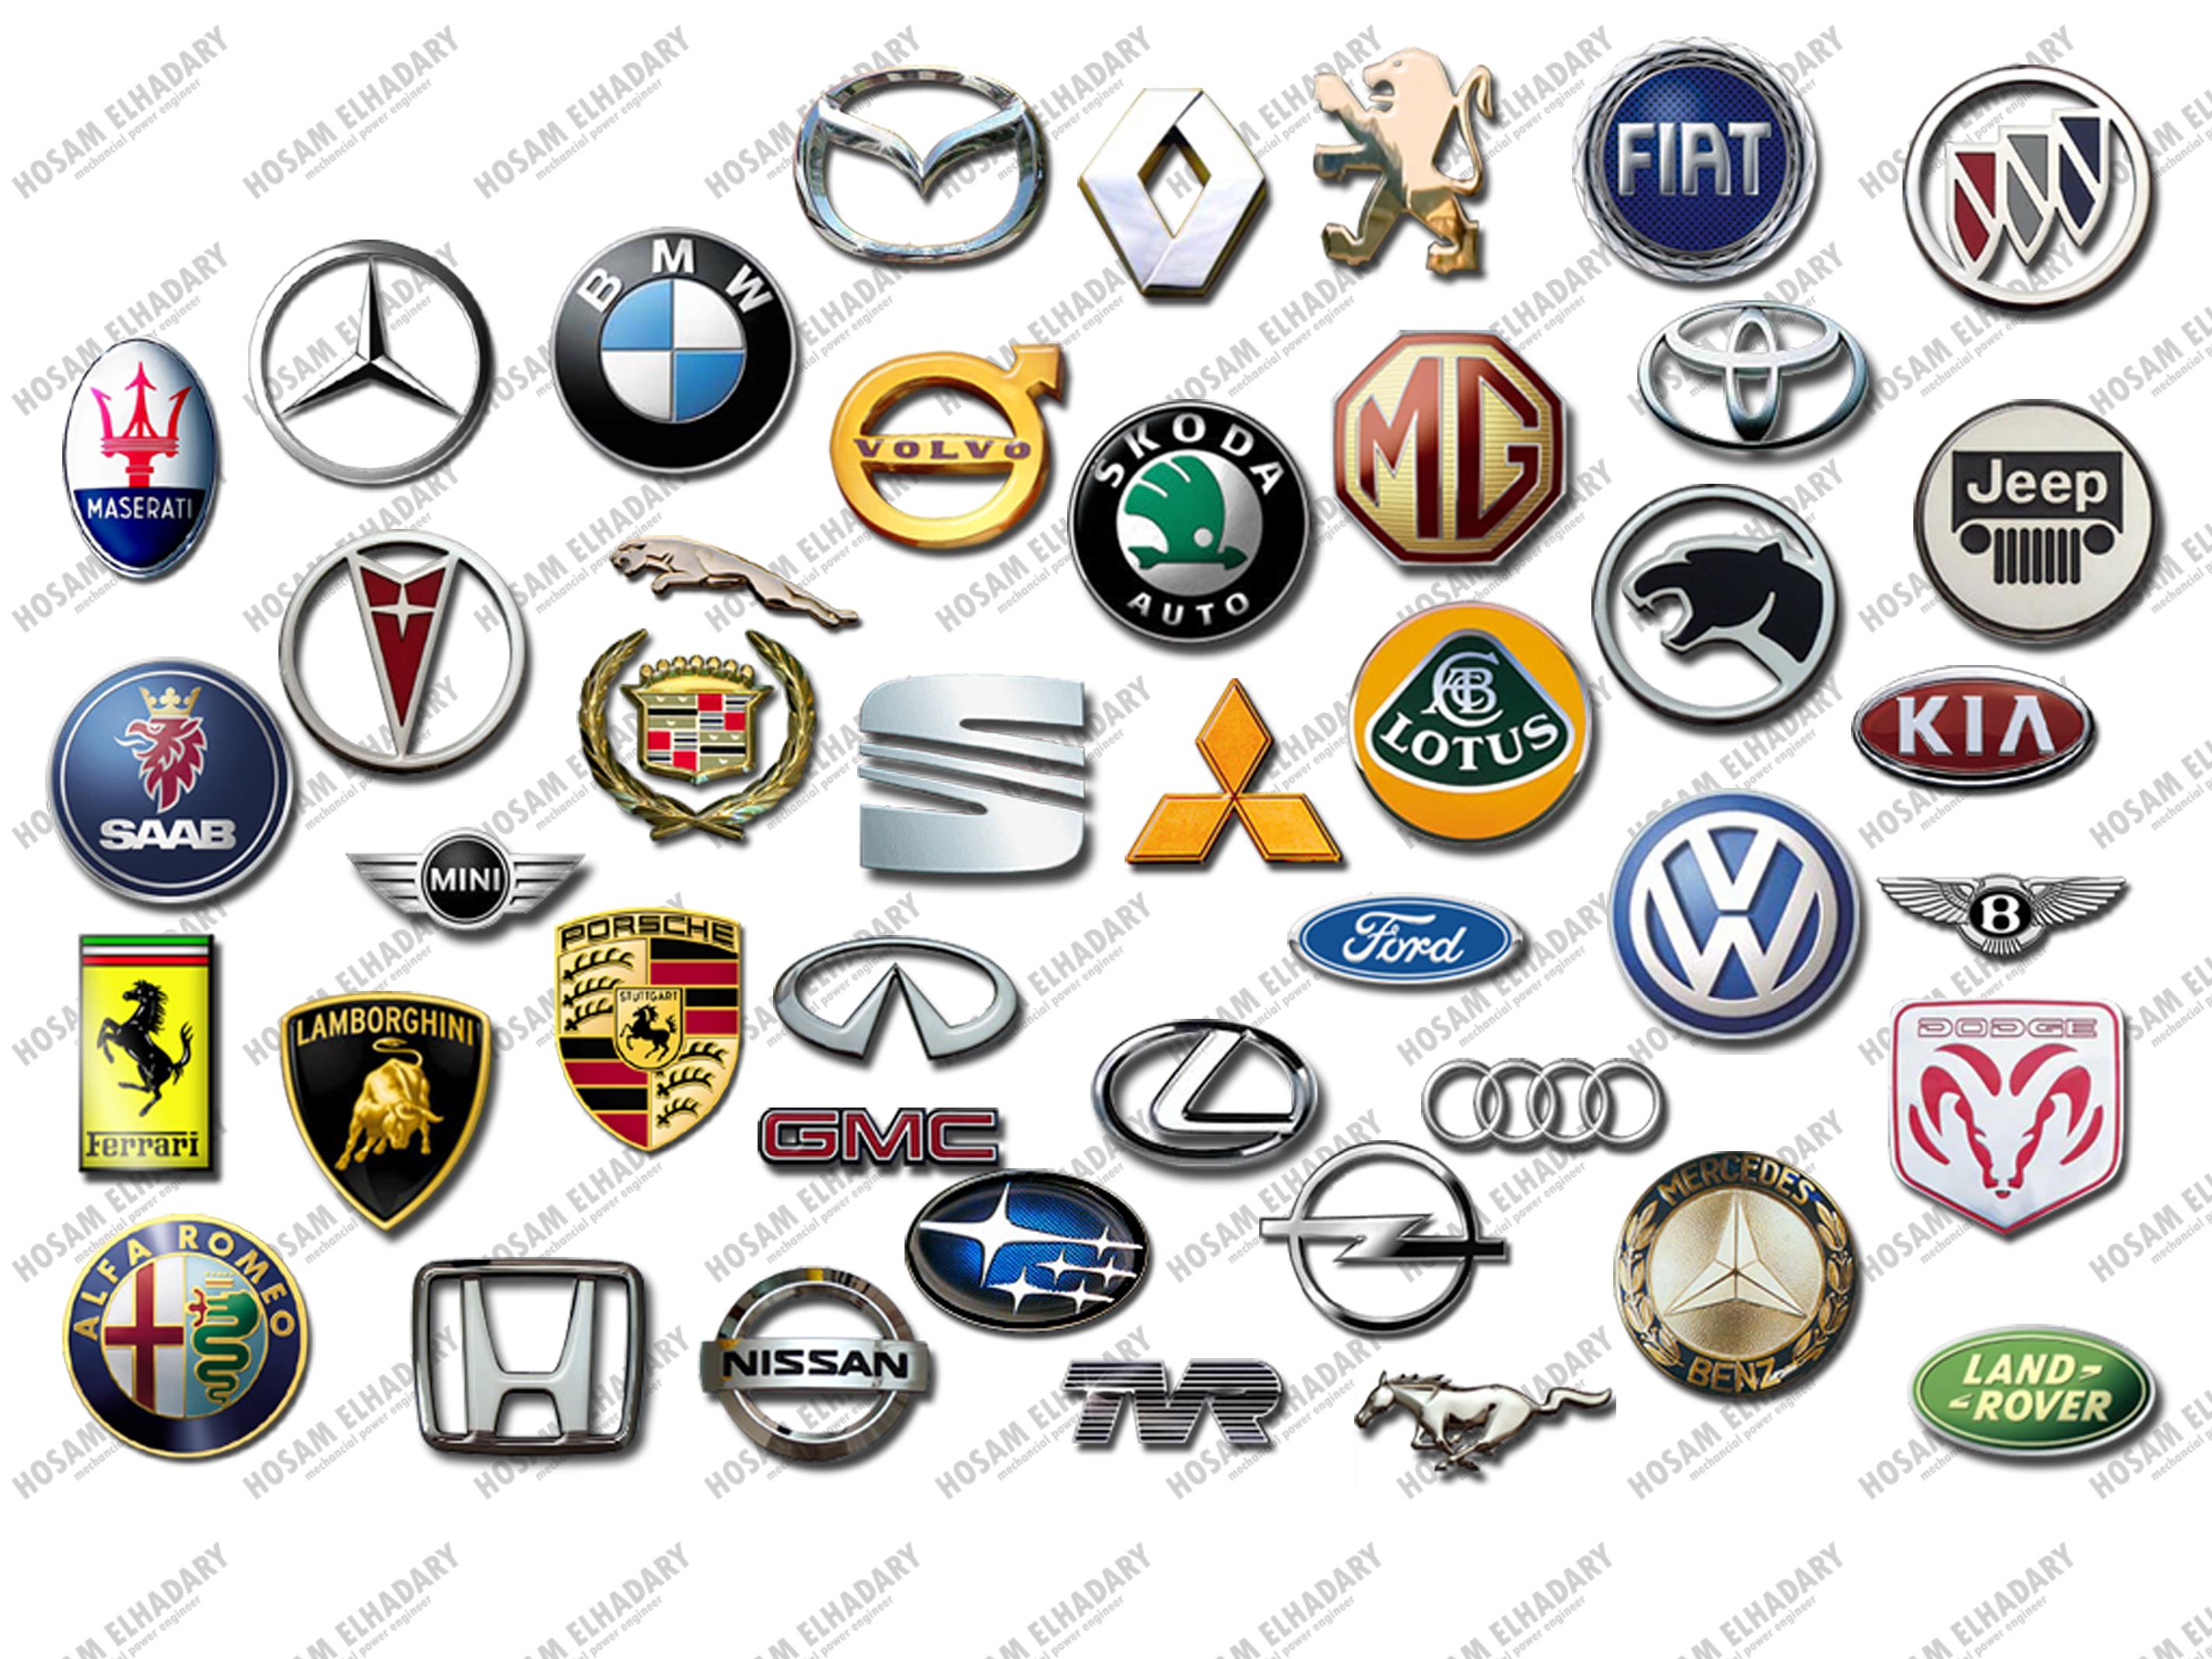 Car Logos wallpaper Car Logos hd wallpaper background desktop 2844x2133